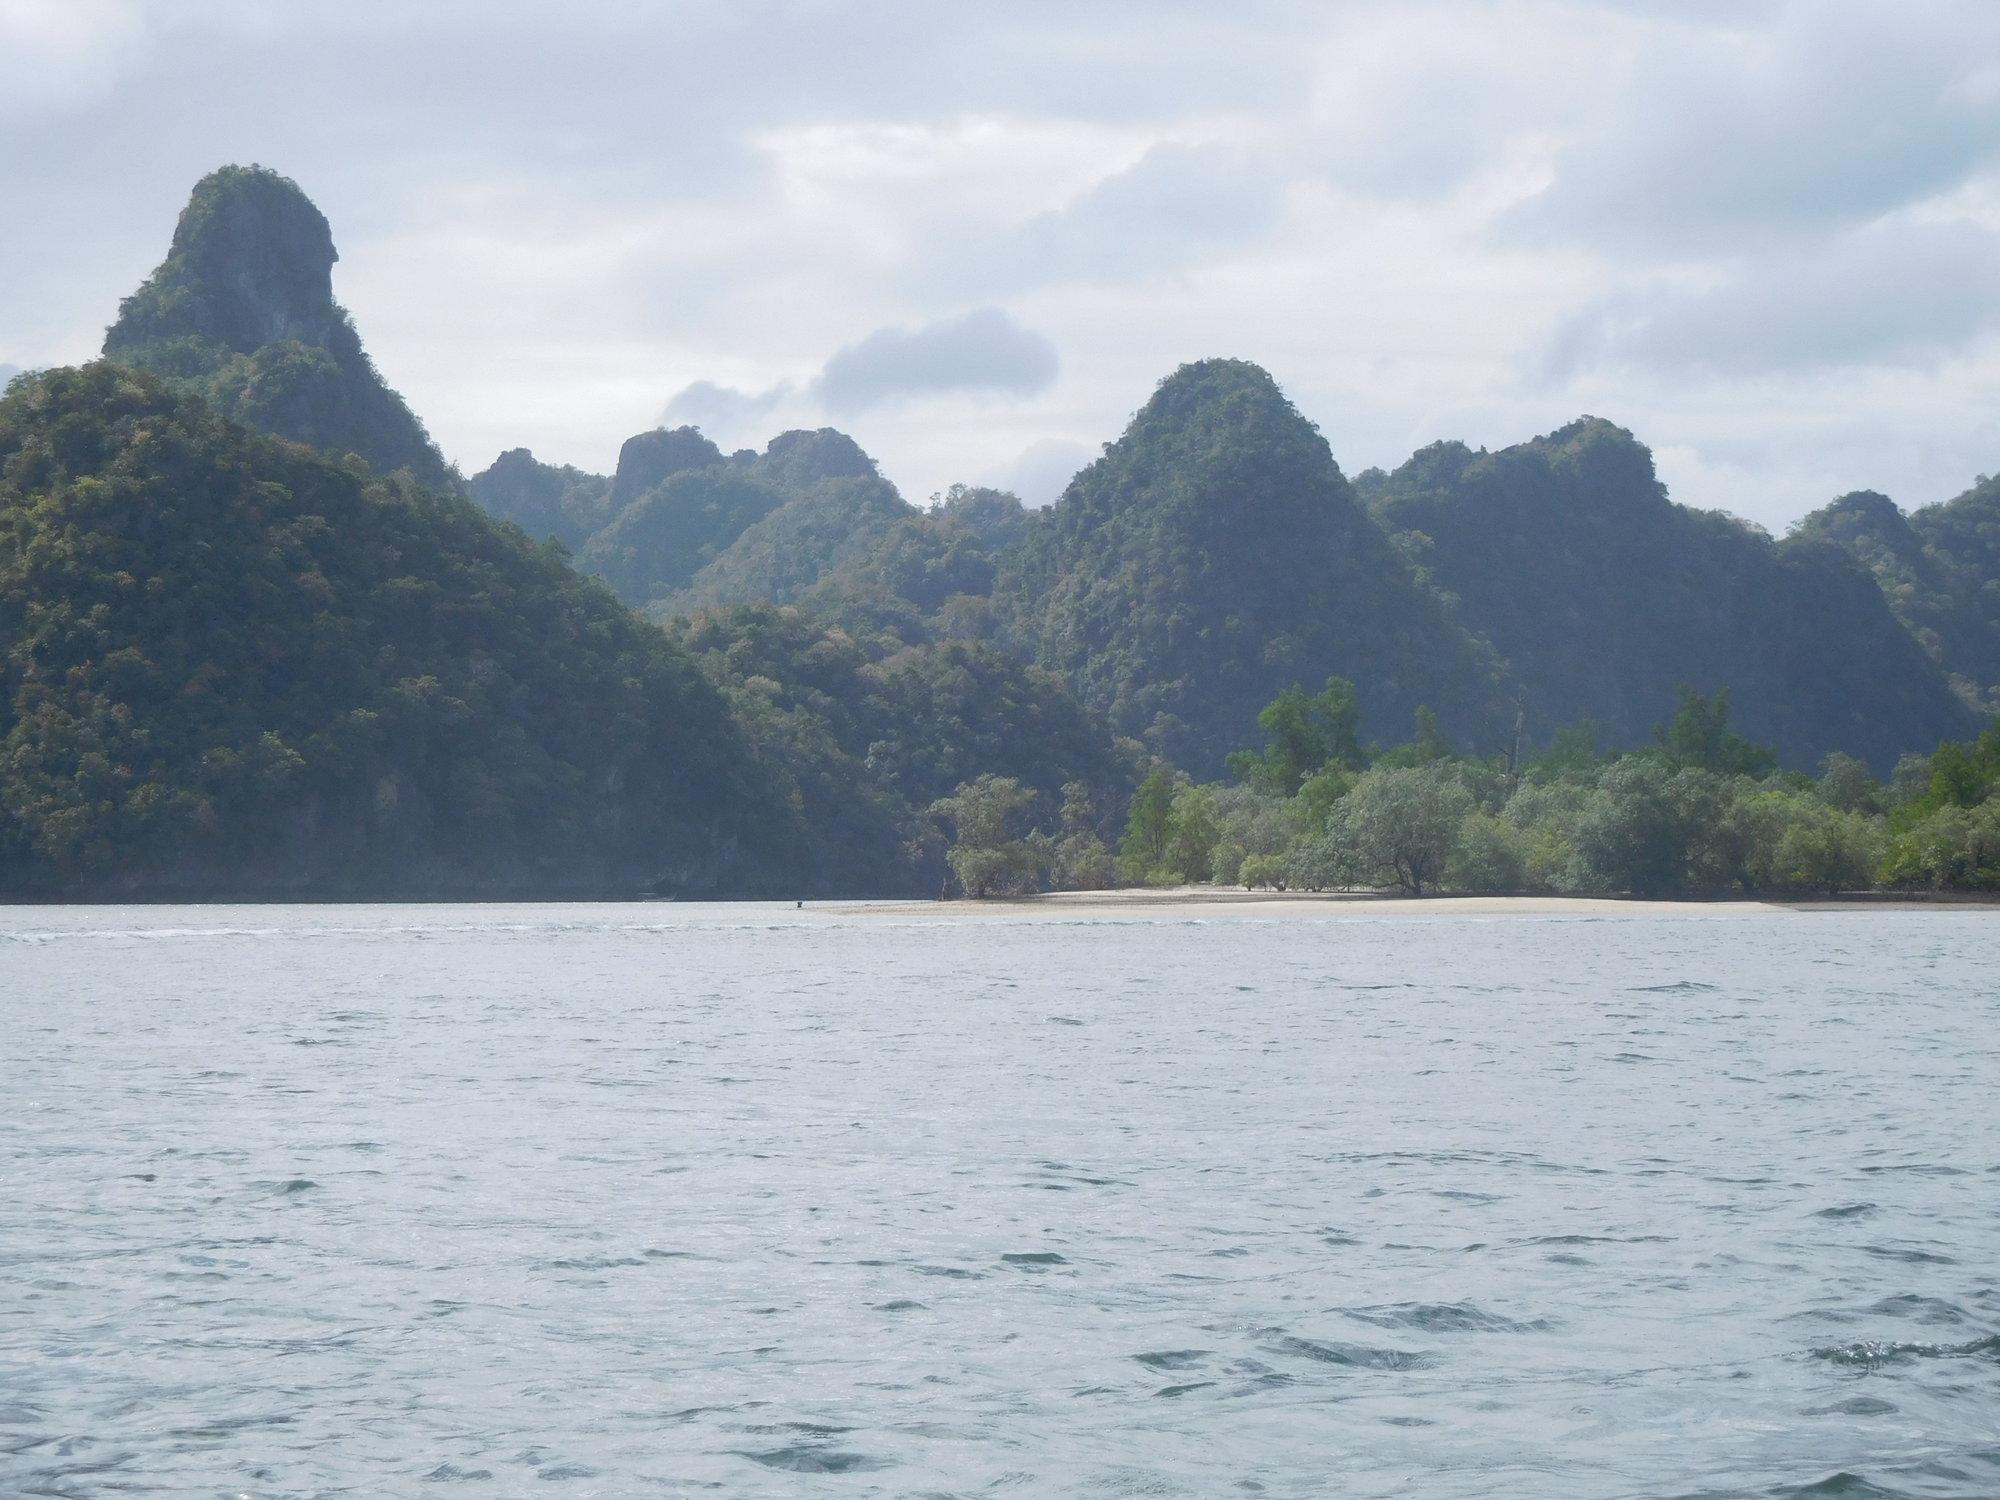 Geopark Kilim, krajina jak z filmu Kong: Ostrov lebek